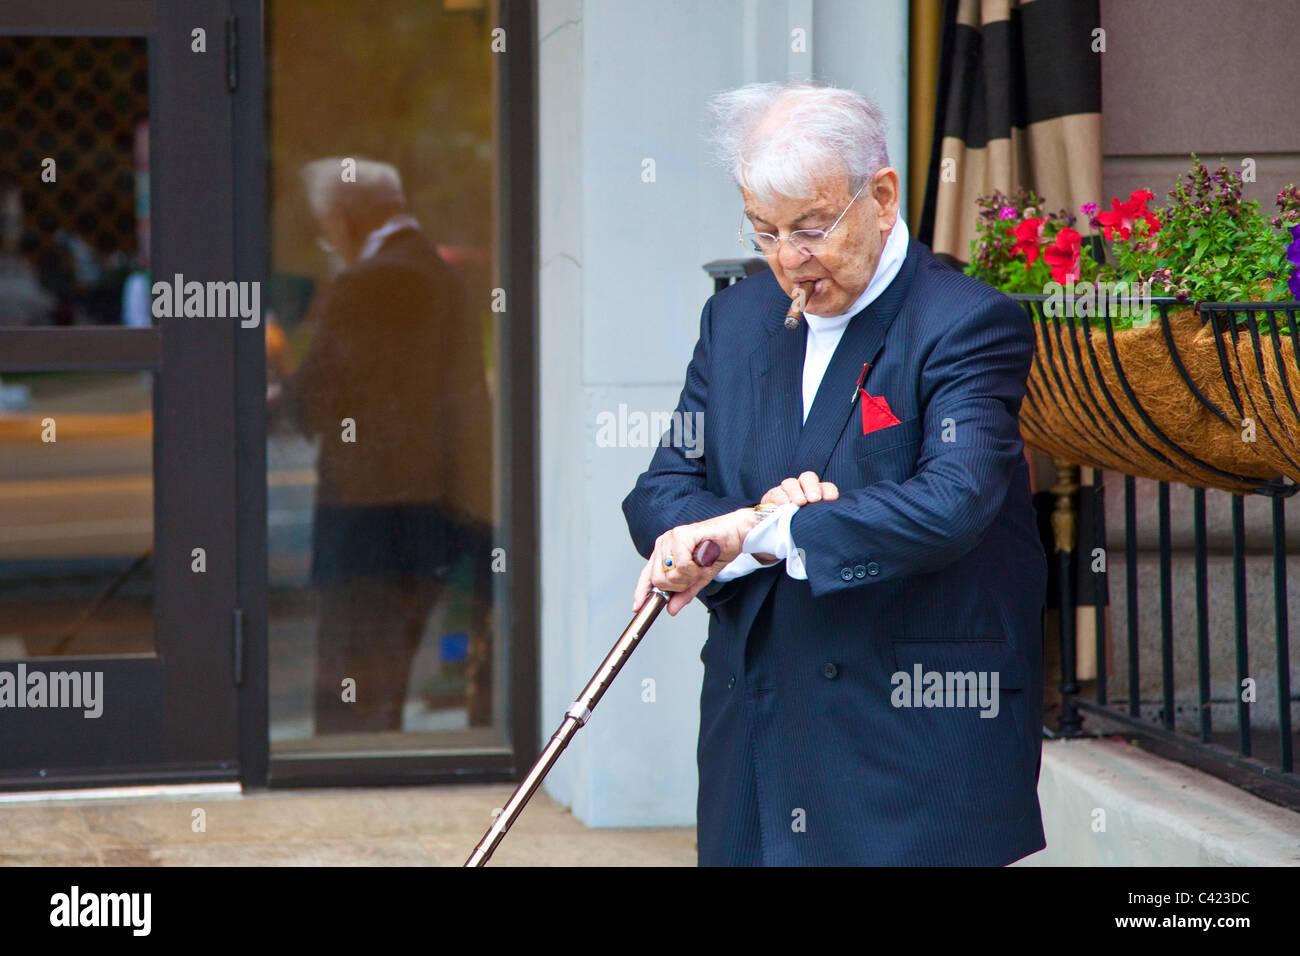 Wealthy elderly man in Washington DC - Stock Image